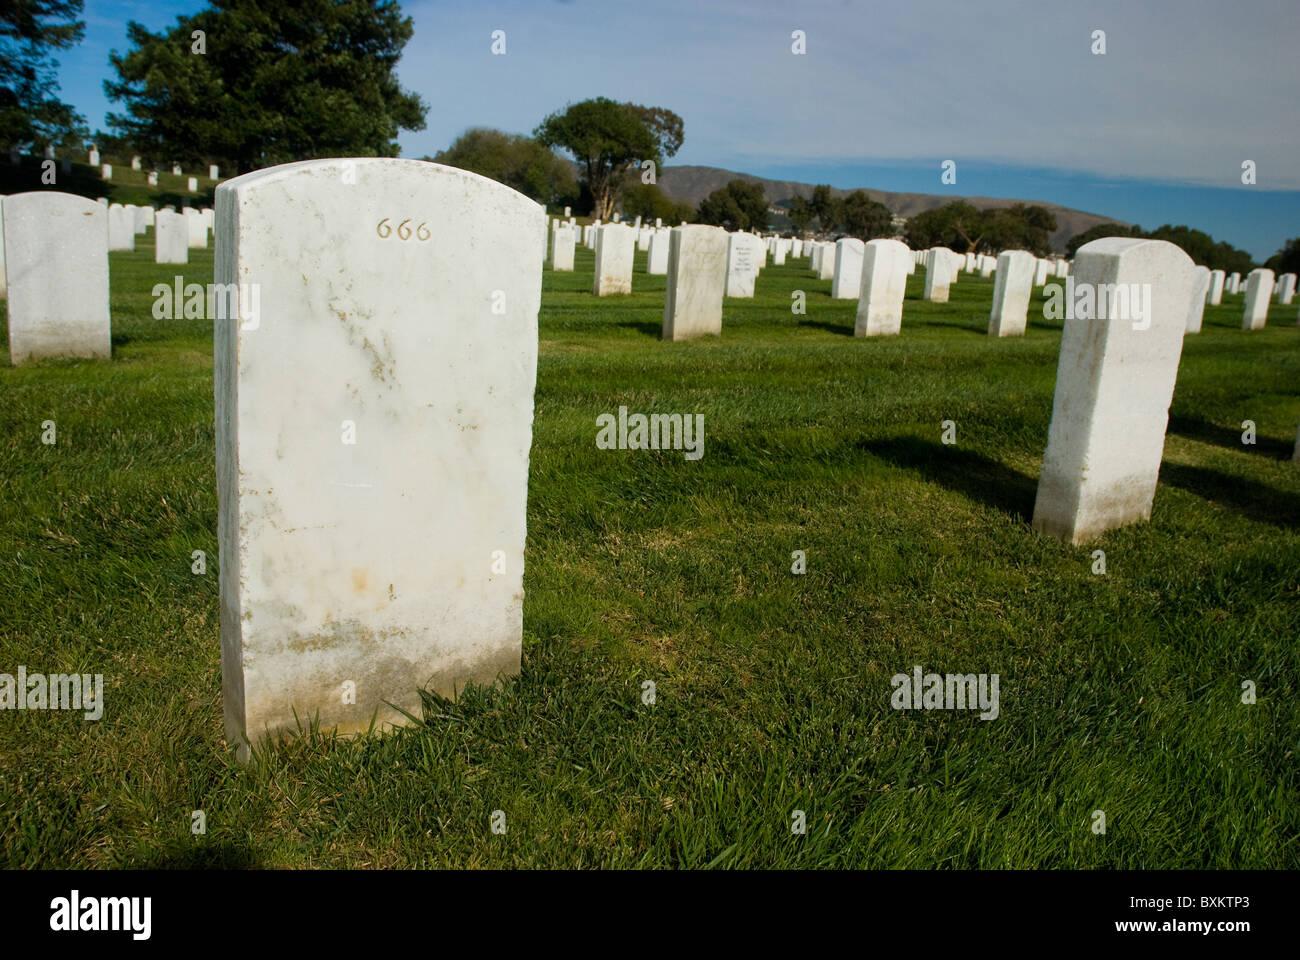 666 headstone at San Francisco National Cemetery in San Bruno, California Stock Photo